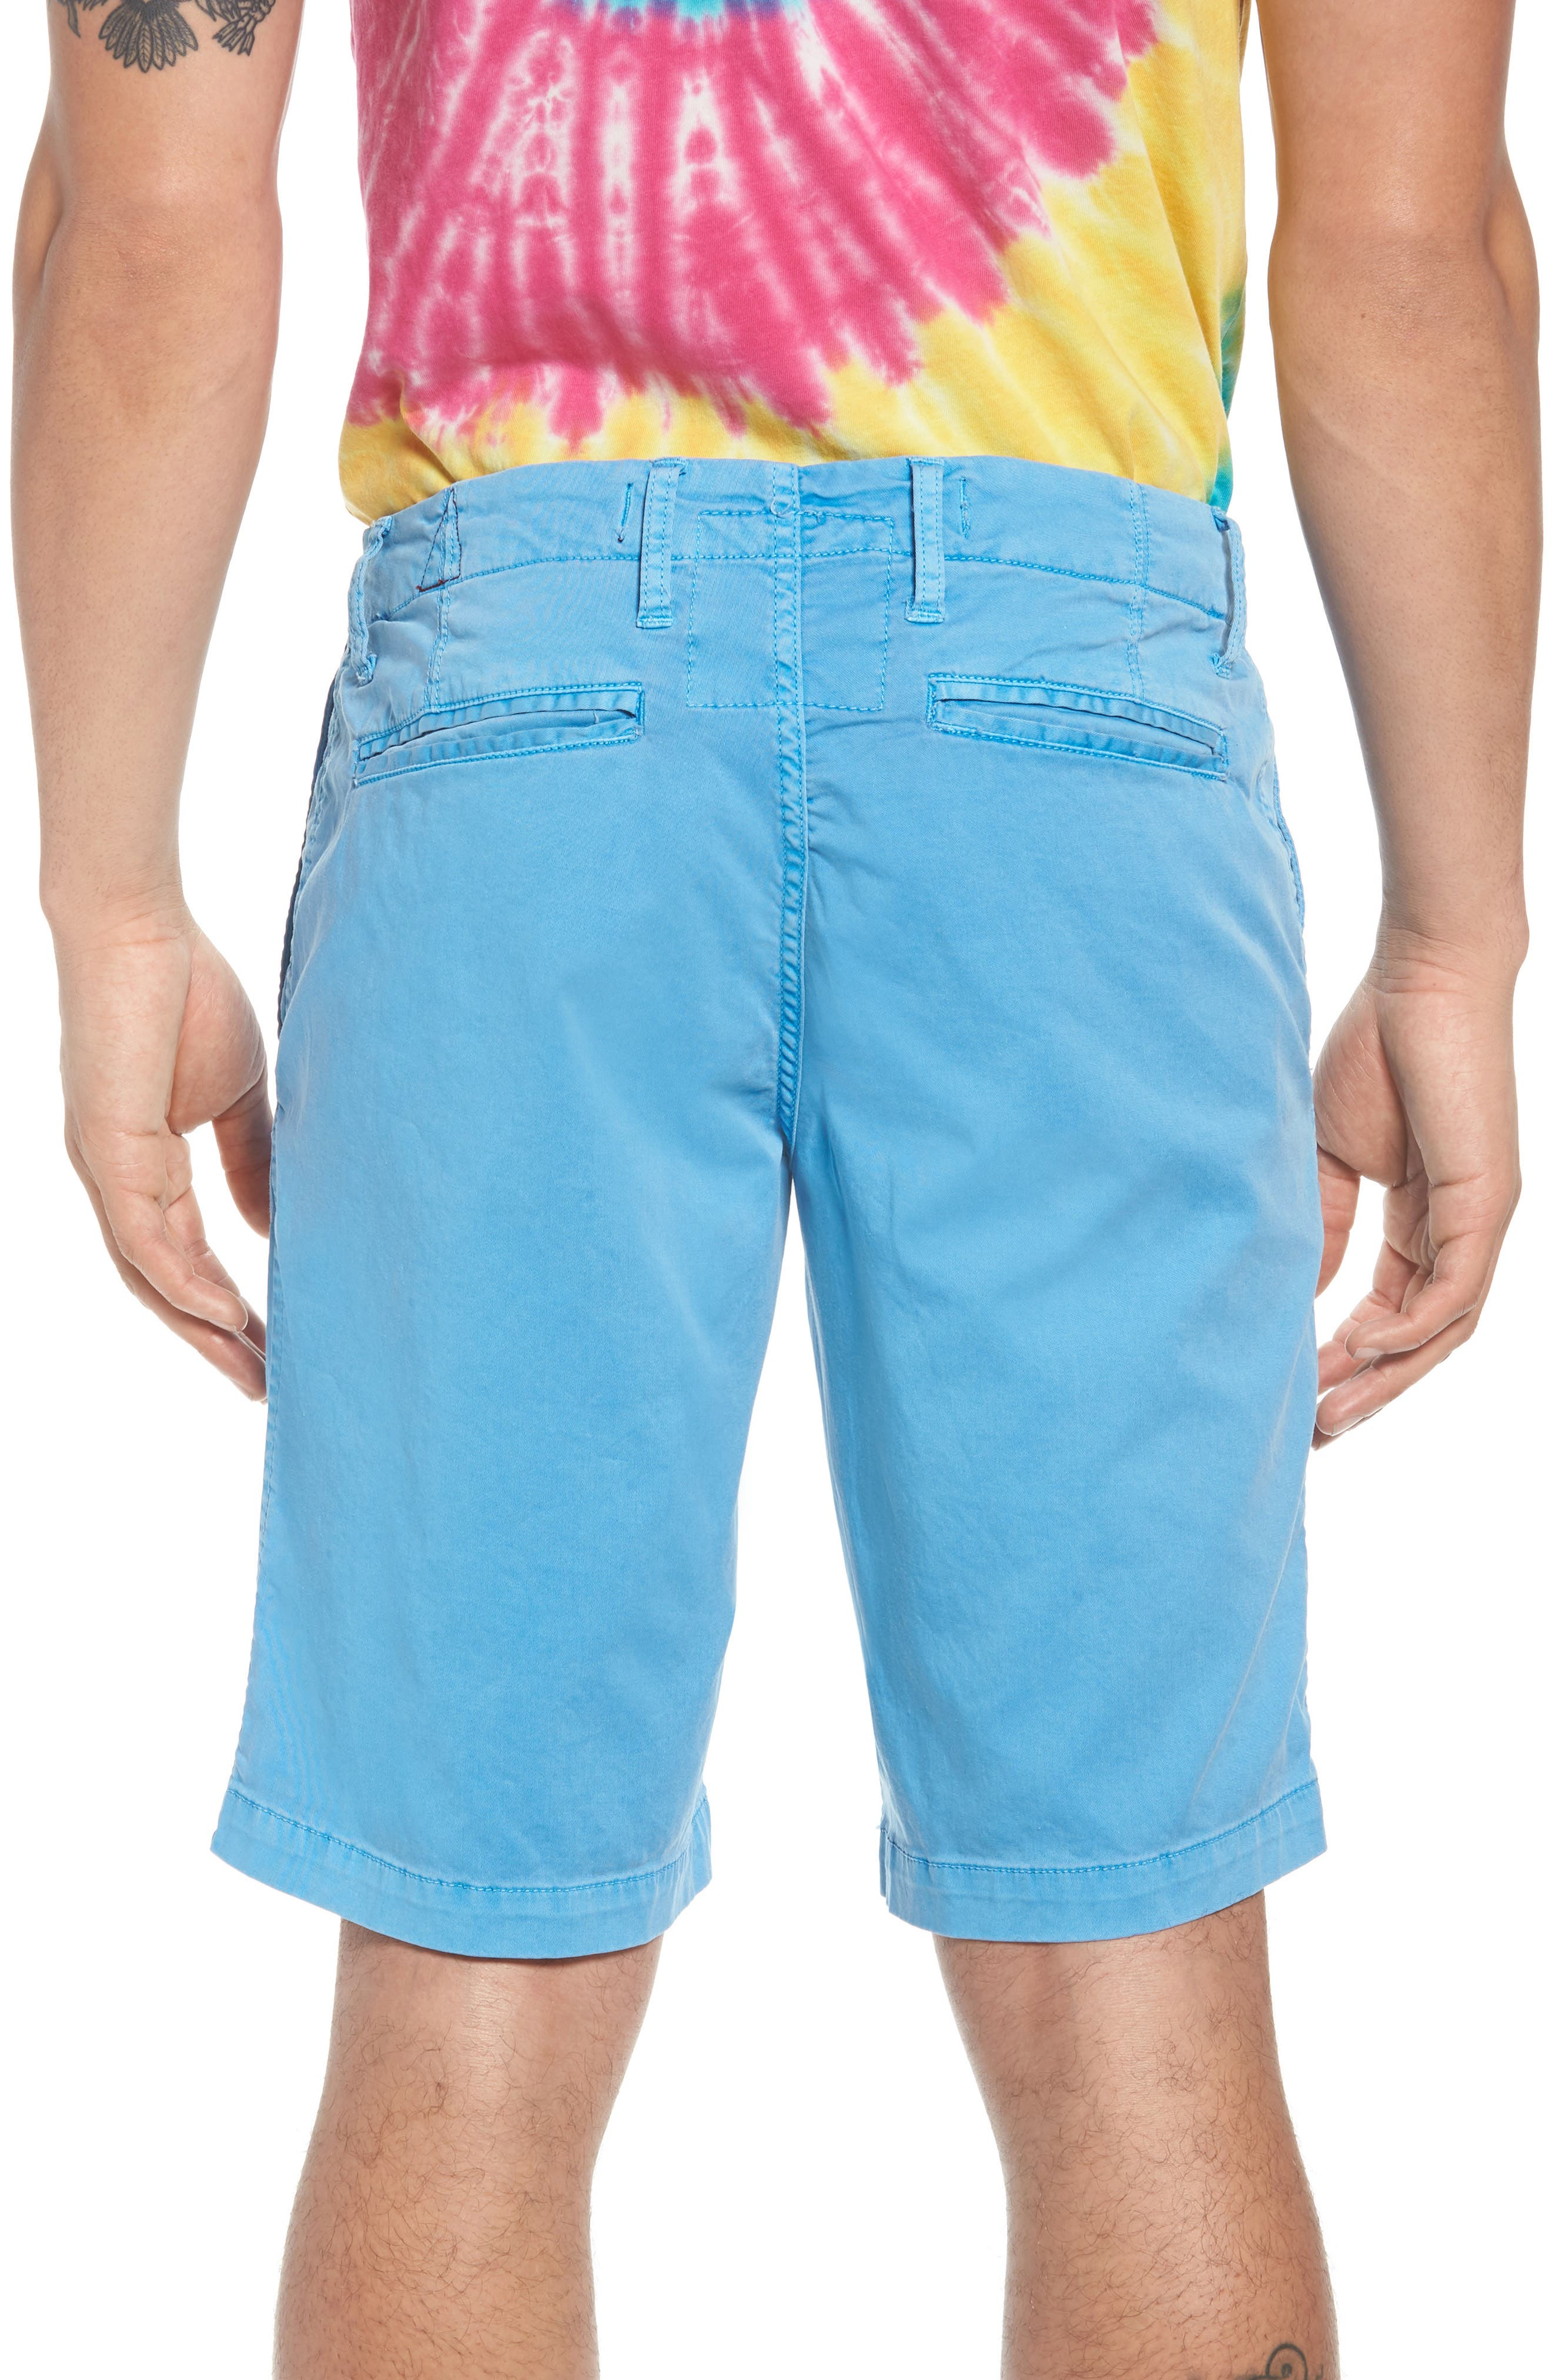 St. Barts Twill Shorts,                             Alternate thumbnail 20, color,